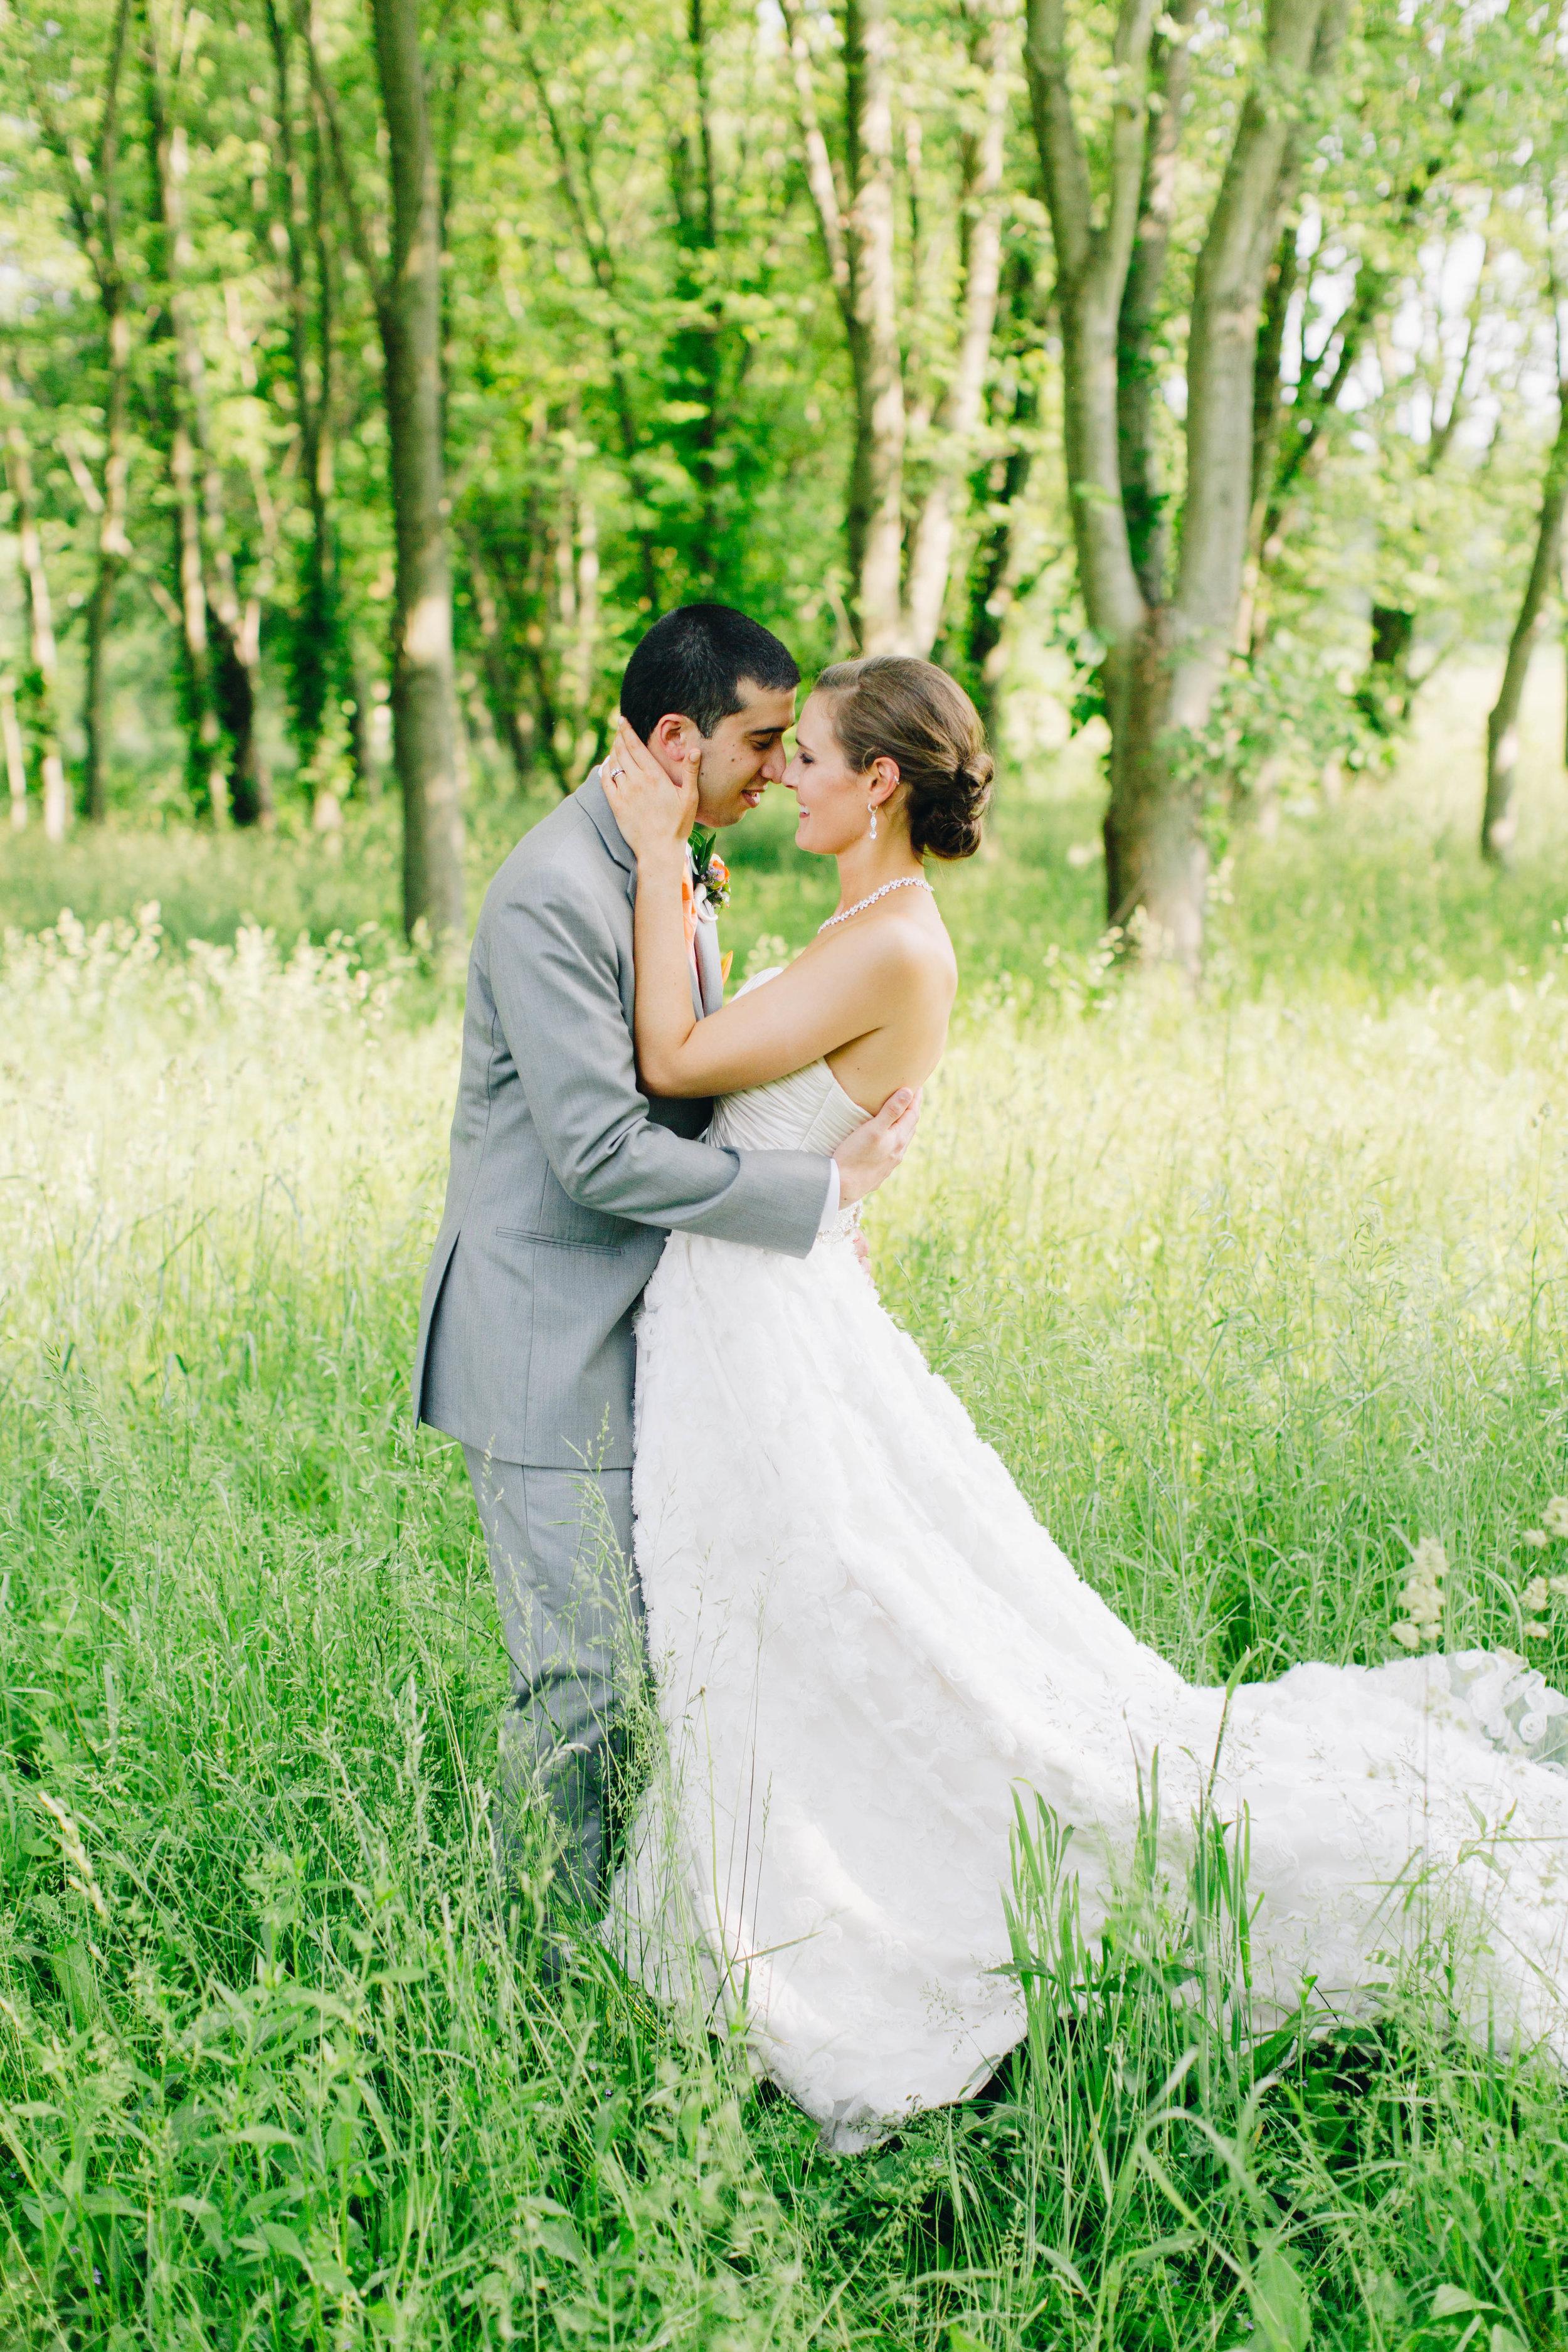 weddinghighlights-19.jpg